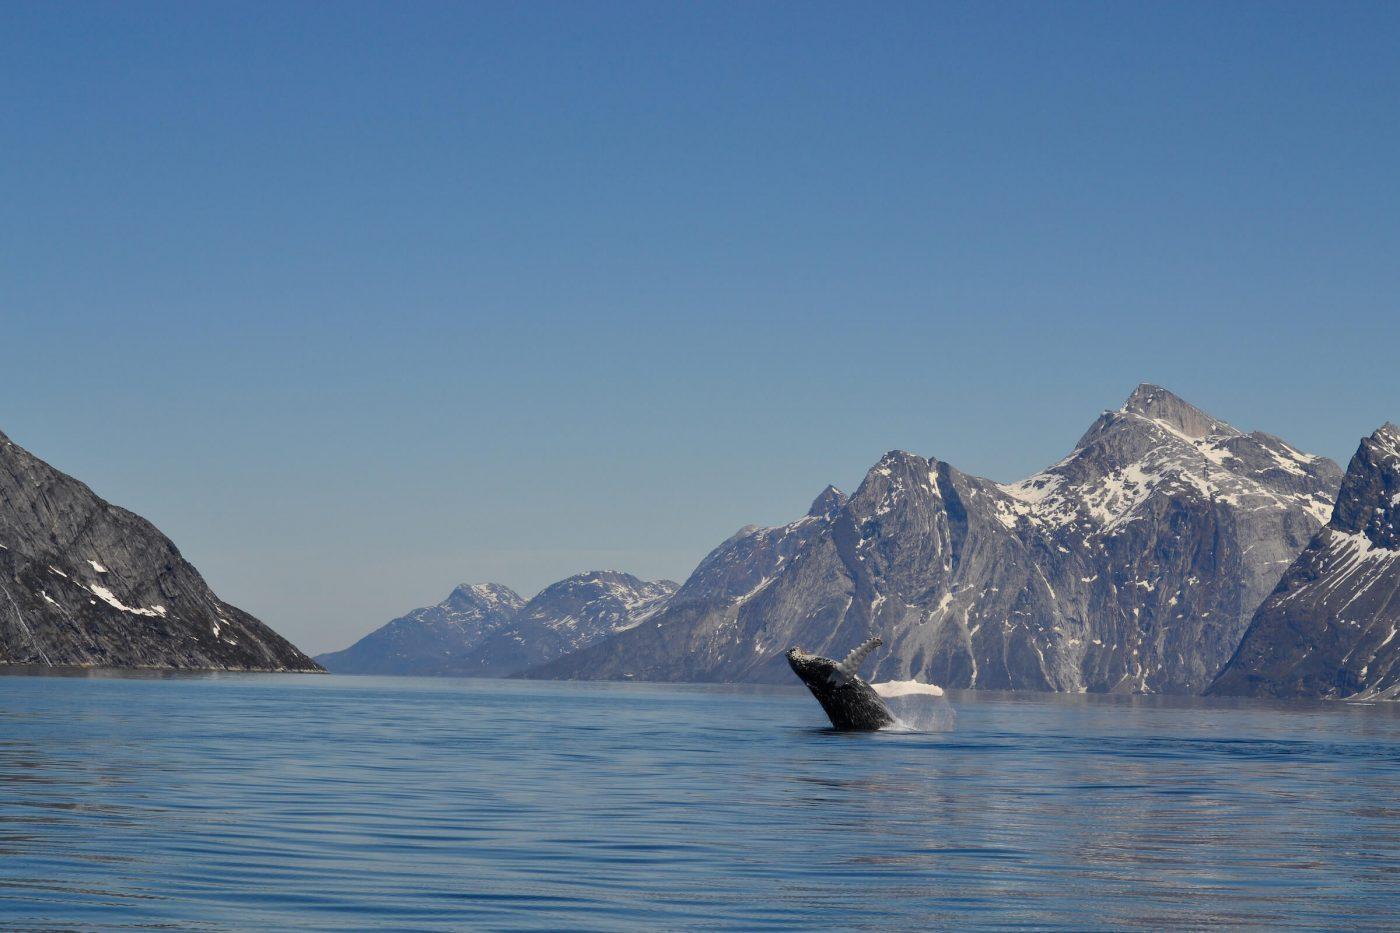 Humpback surface Nuuk. By Klaus Eugenius